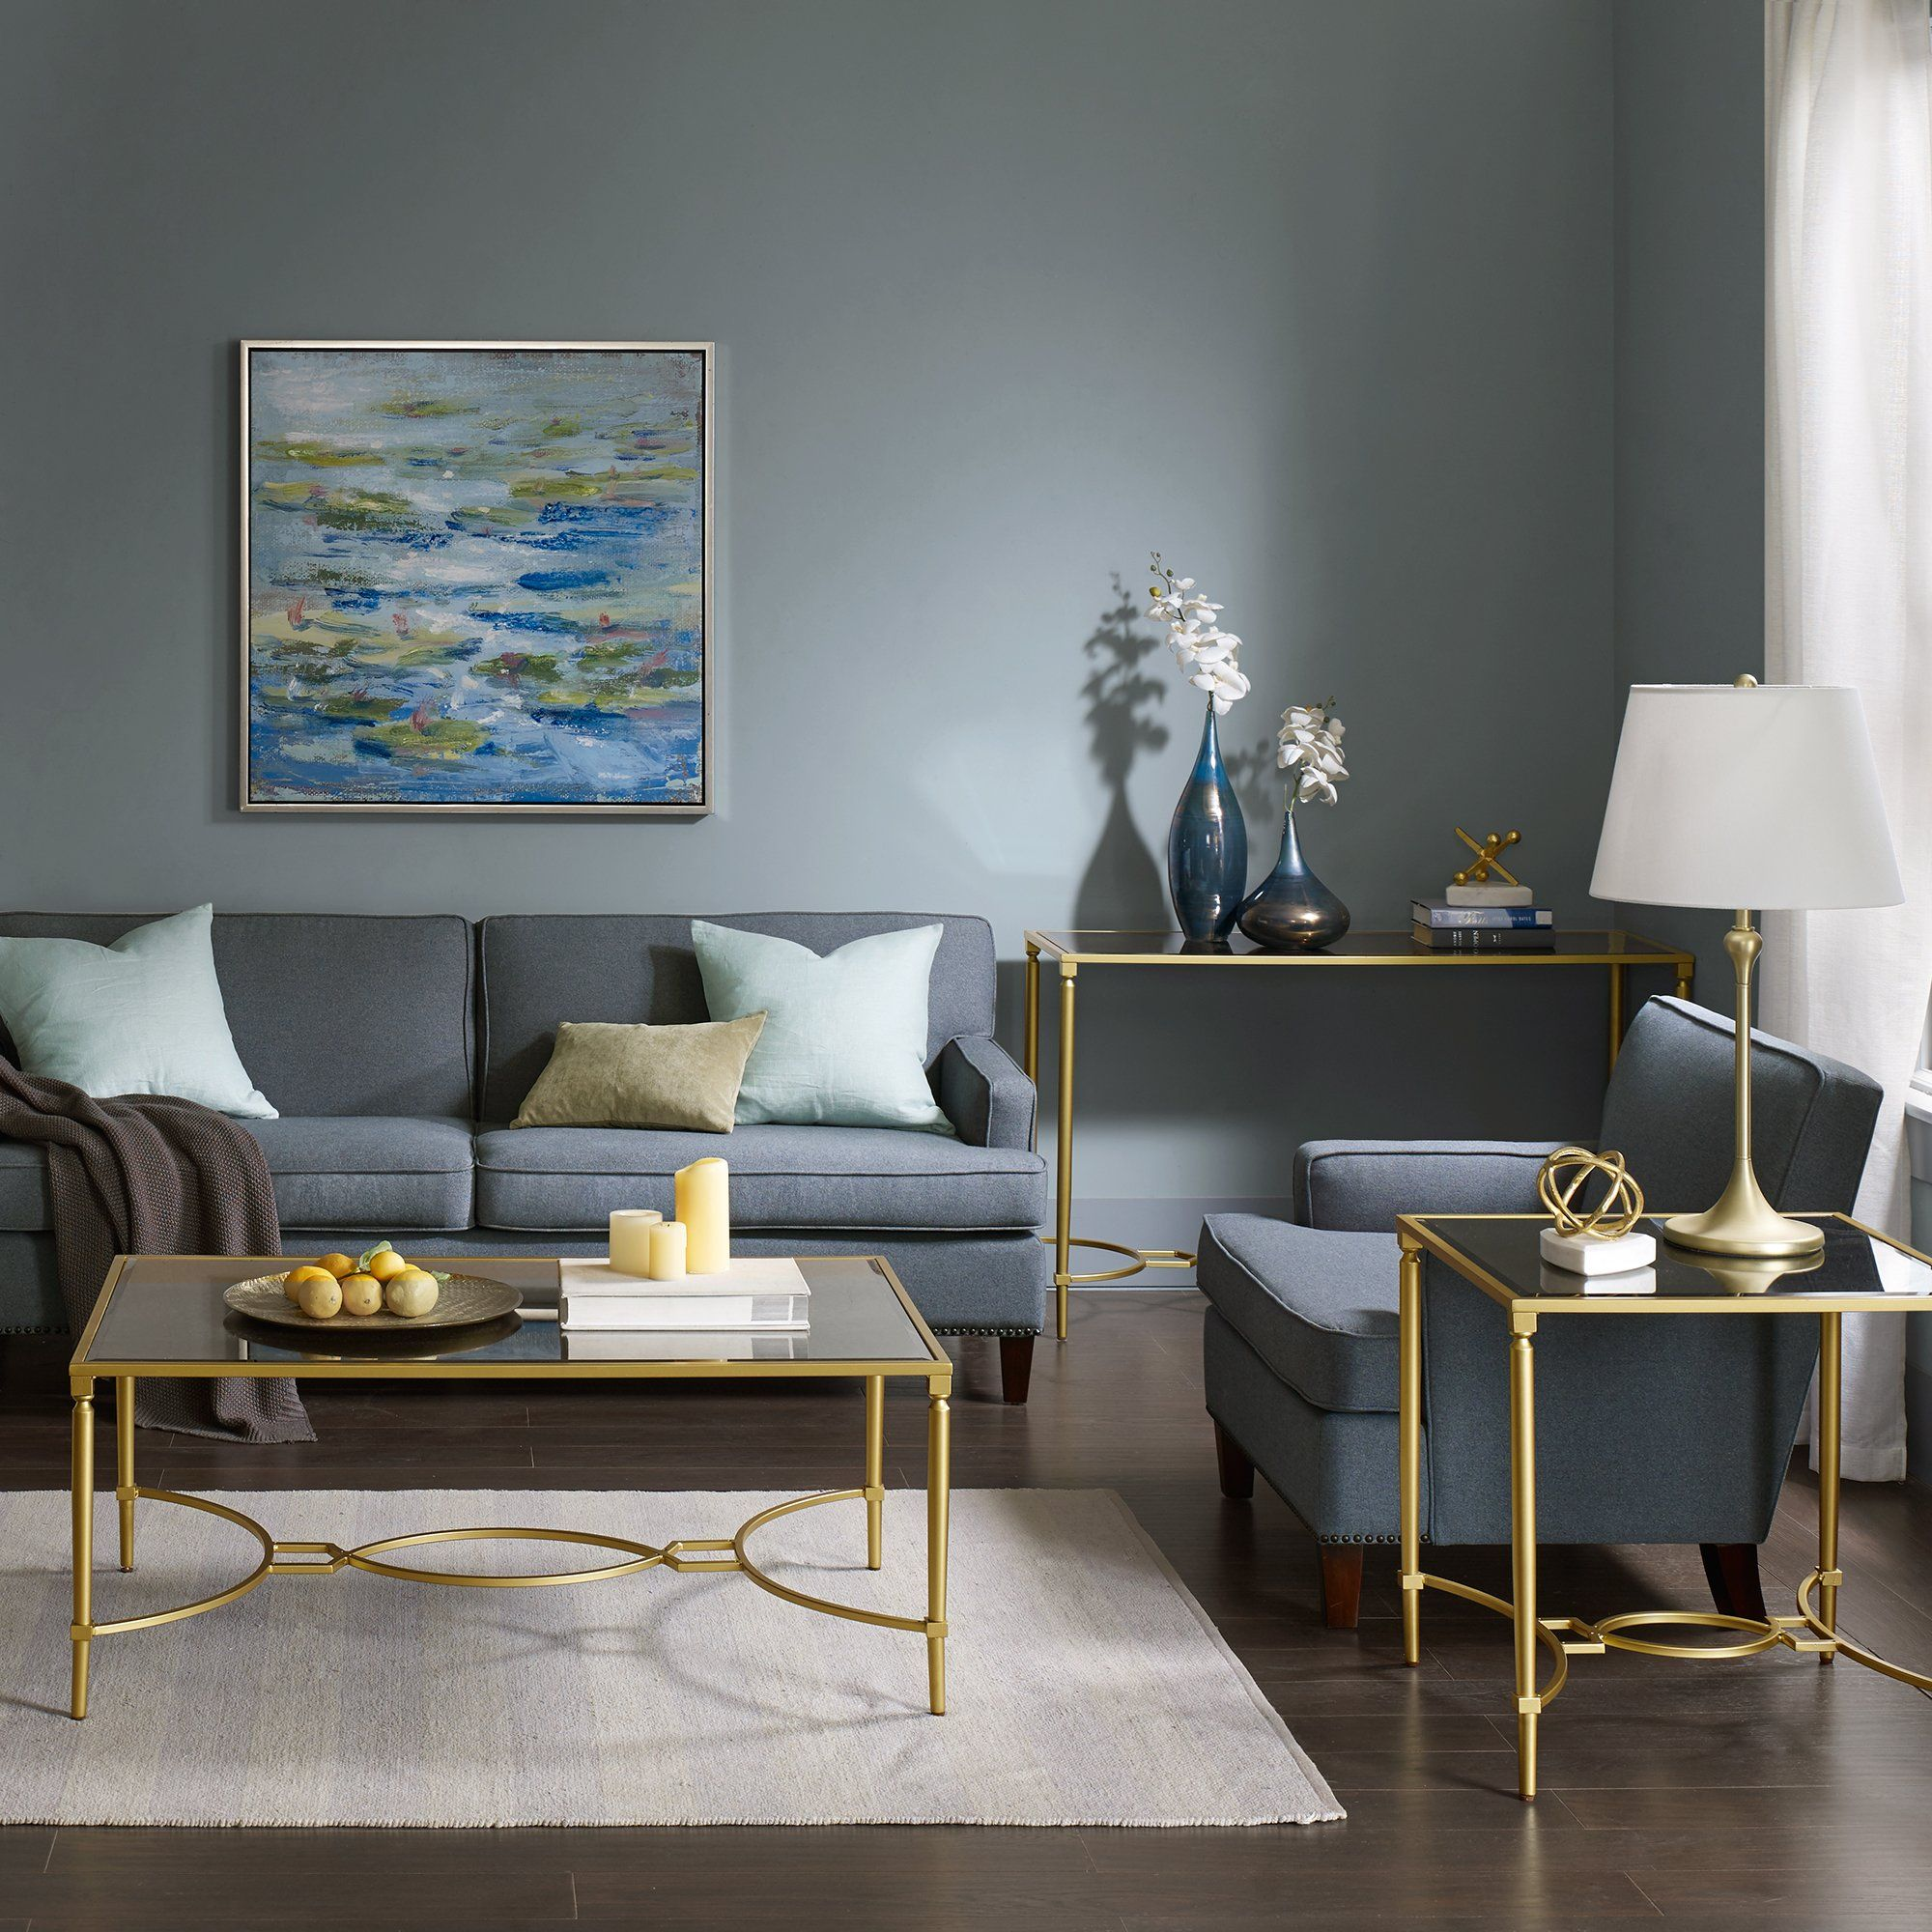 Turner Coffee Table Gold Living Room Teal Living Room Decor Teal Living Rooms #teal #and #gold #living #room #decor